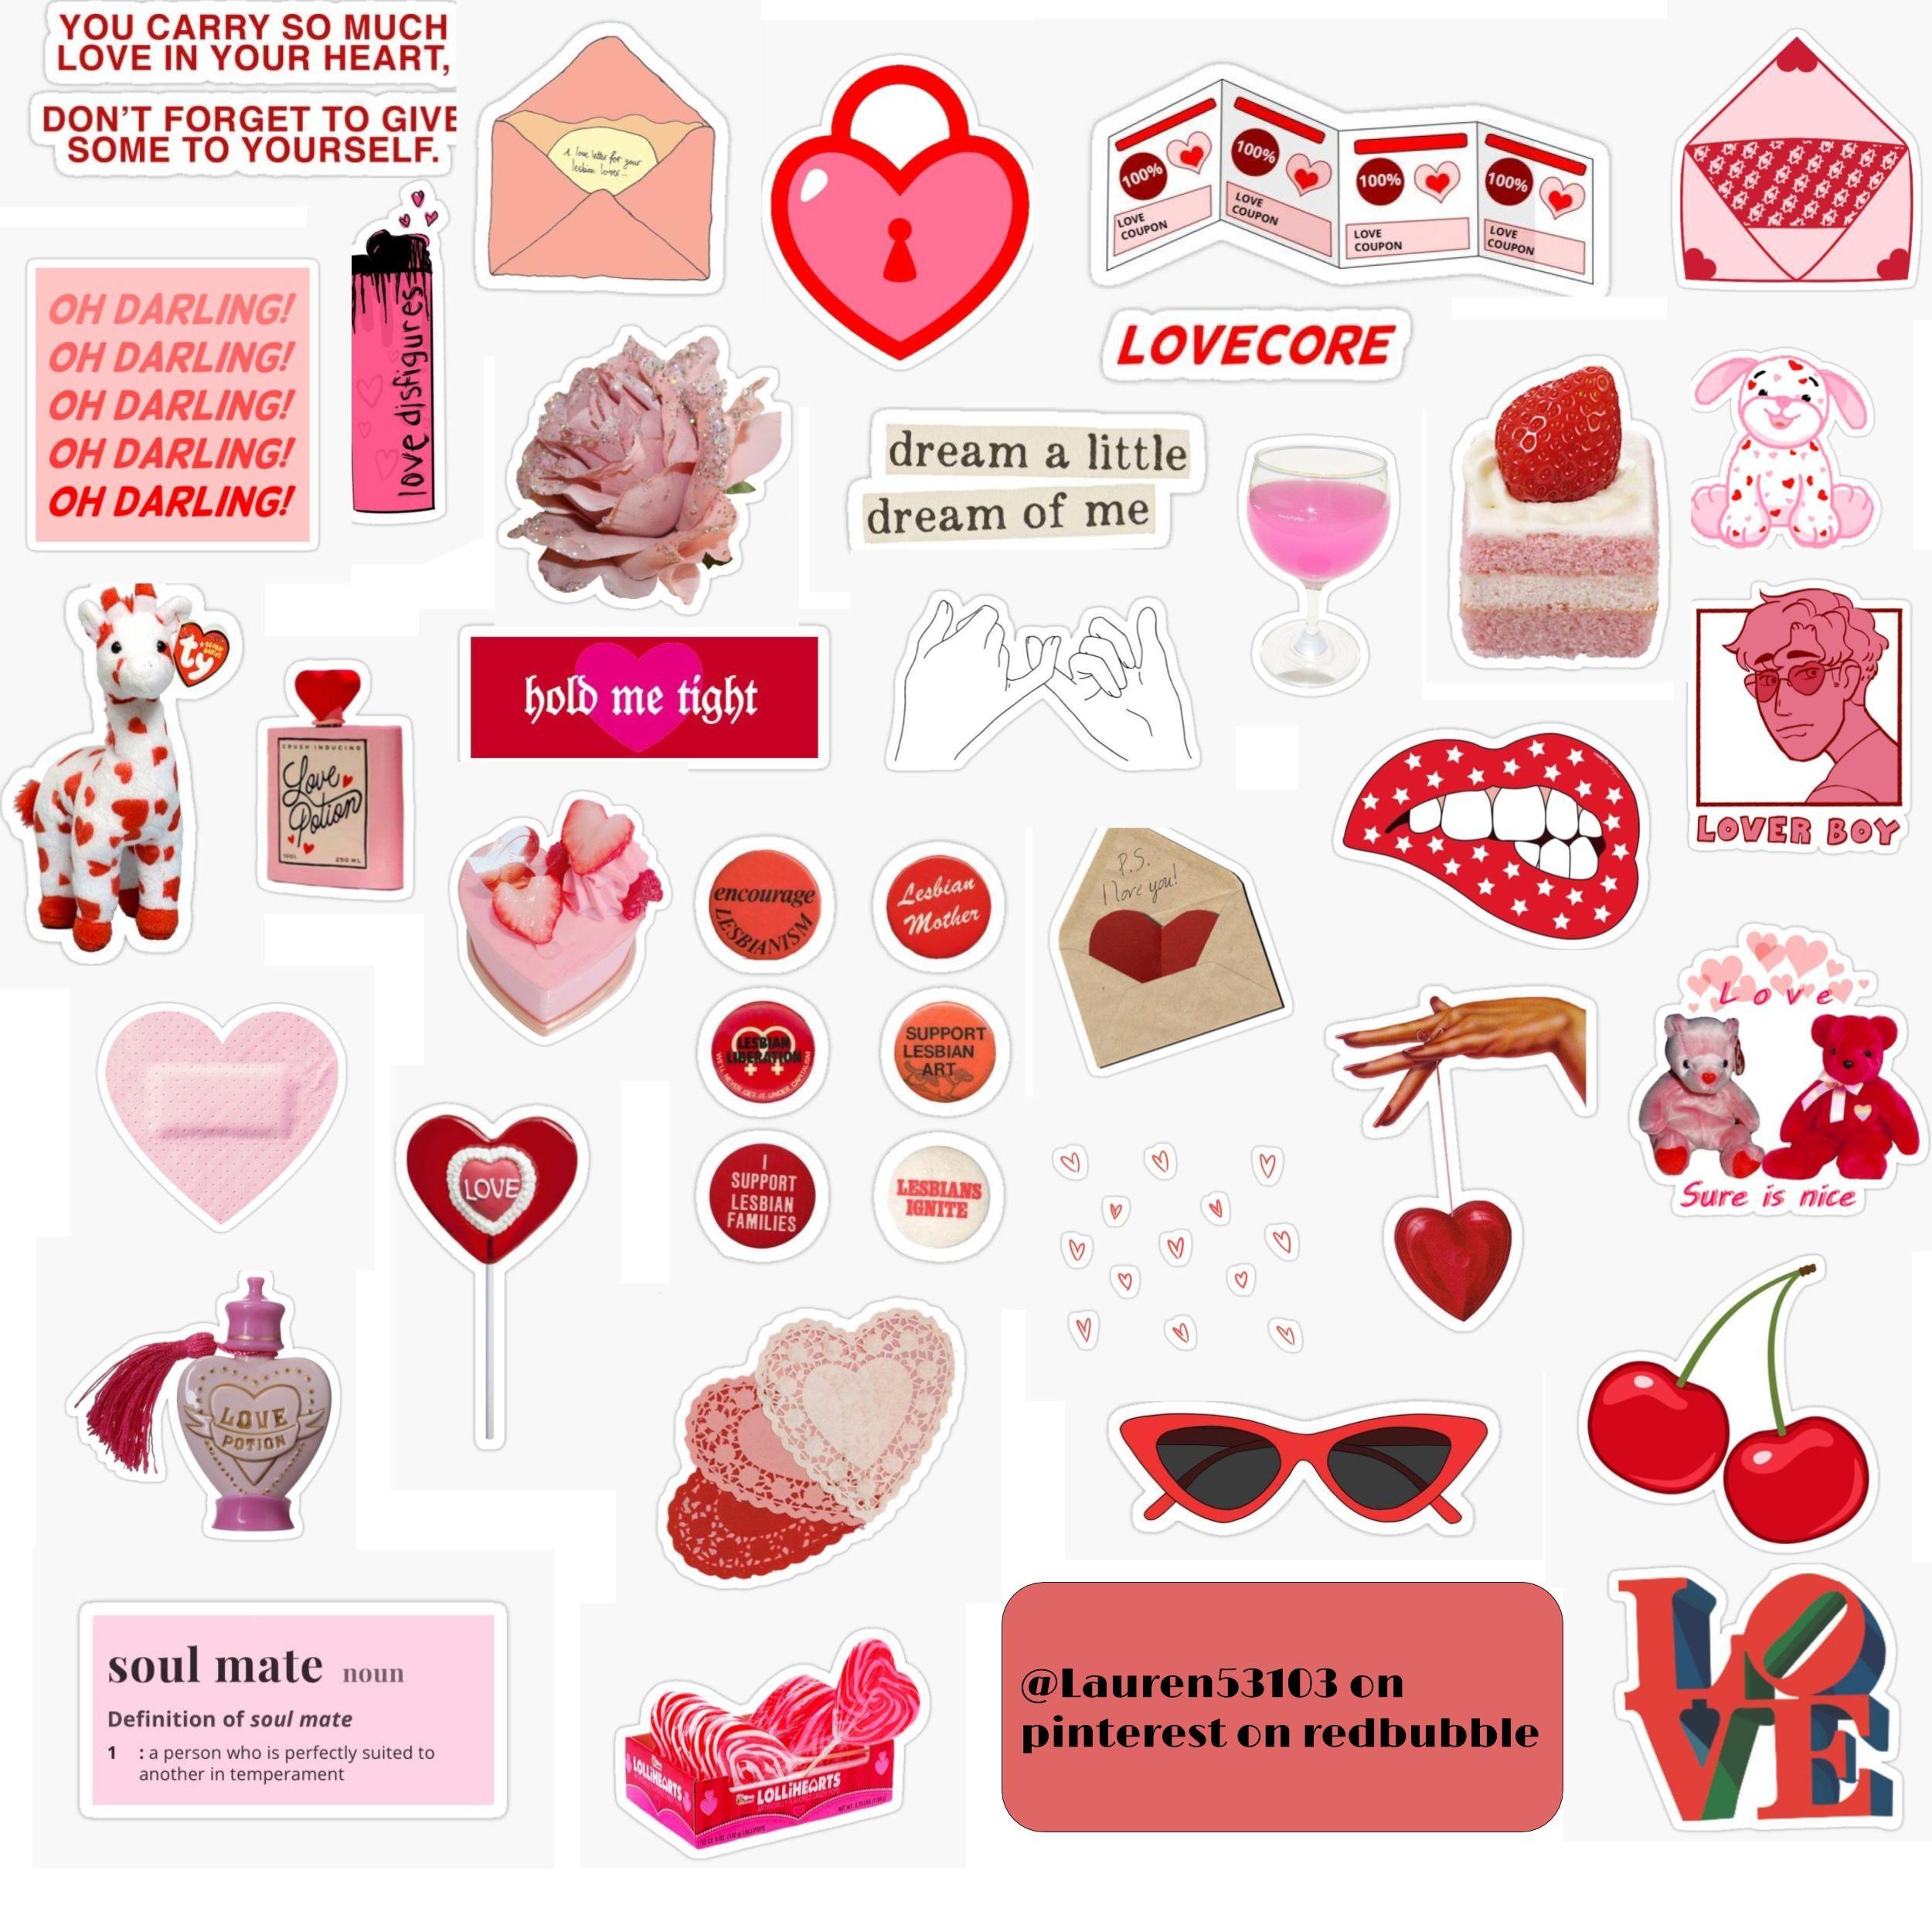 Bratz Stickers Stickers Pink Aesthetic Stickers Pink Stickers Y2k Pink Sticker Pack Pink Stickers Kawaii Y2k Sticker Bundle Stickers Stickers Labels Tags Deshpandefoundationindia Org